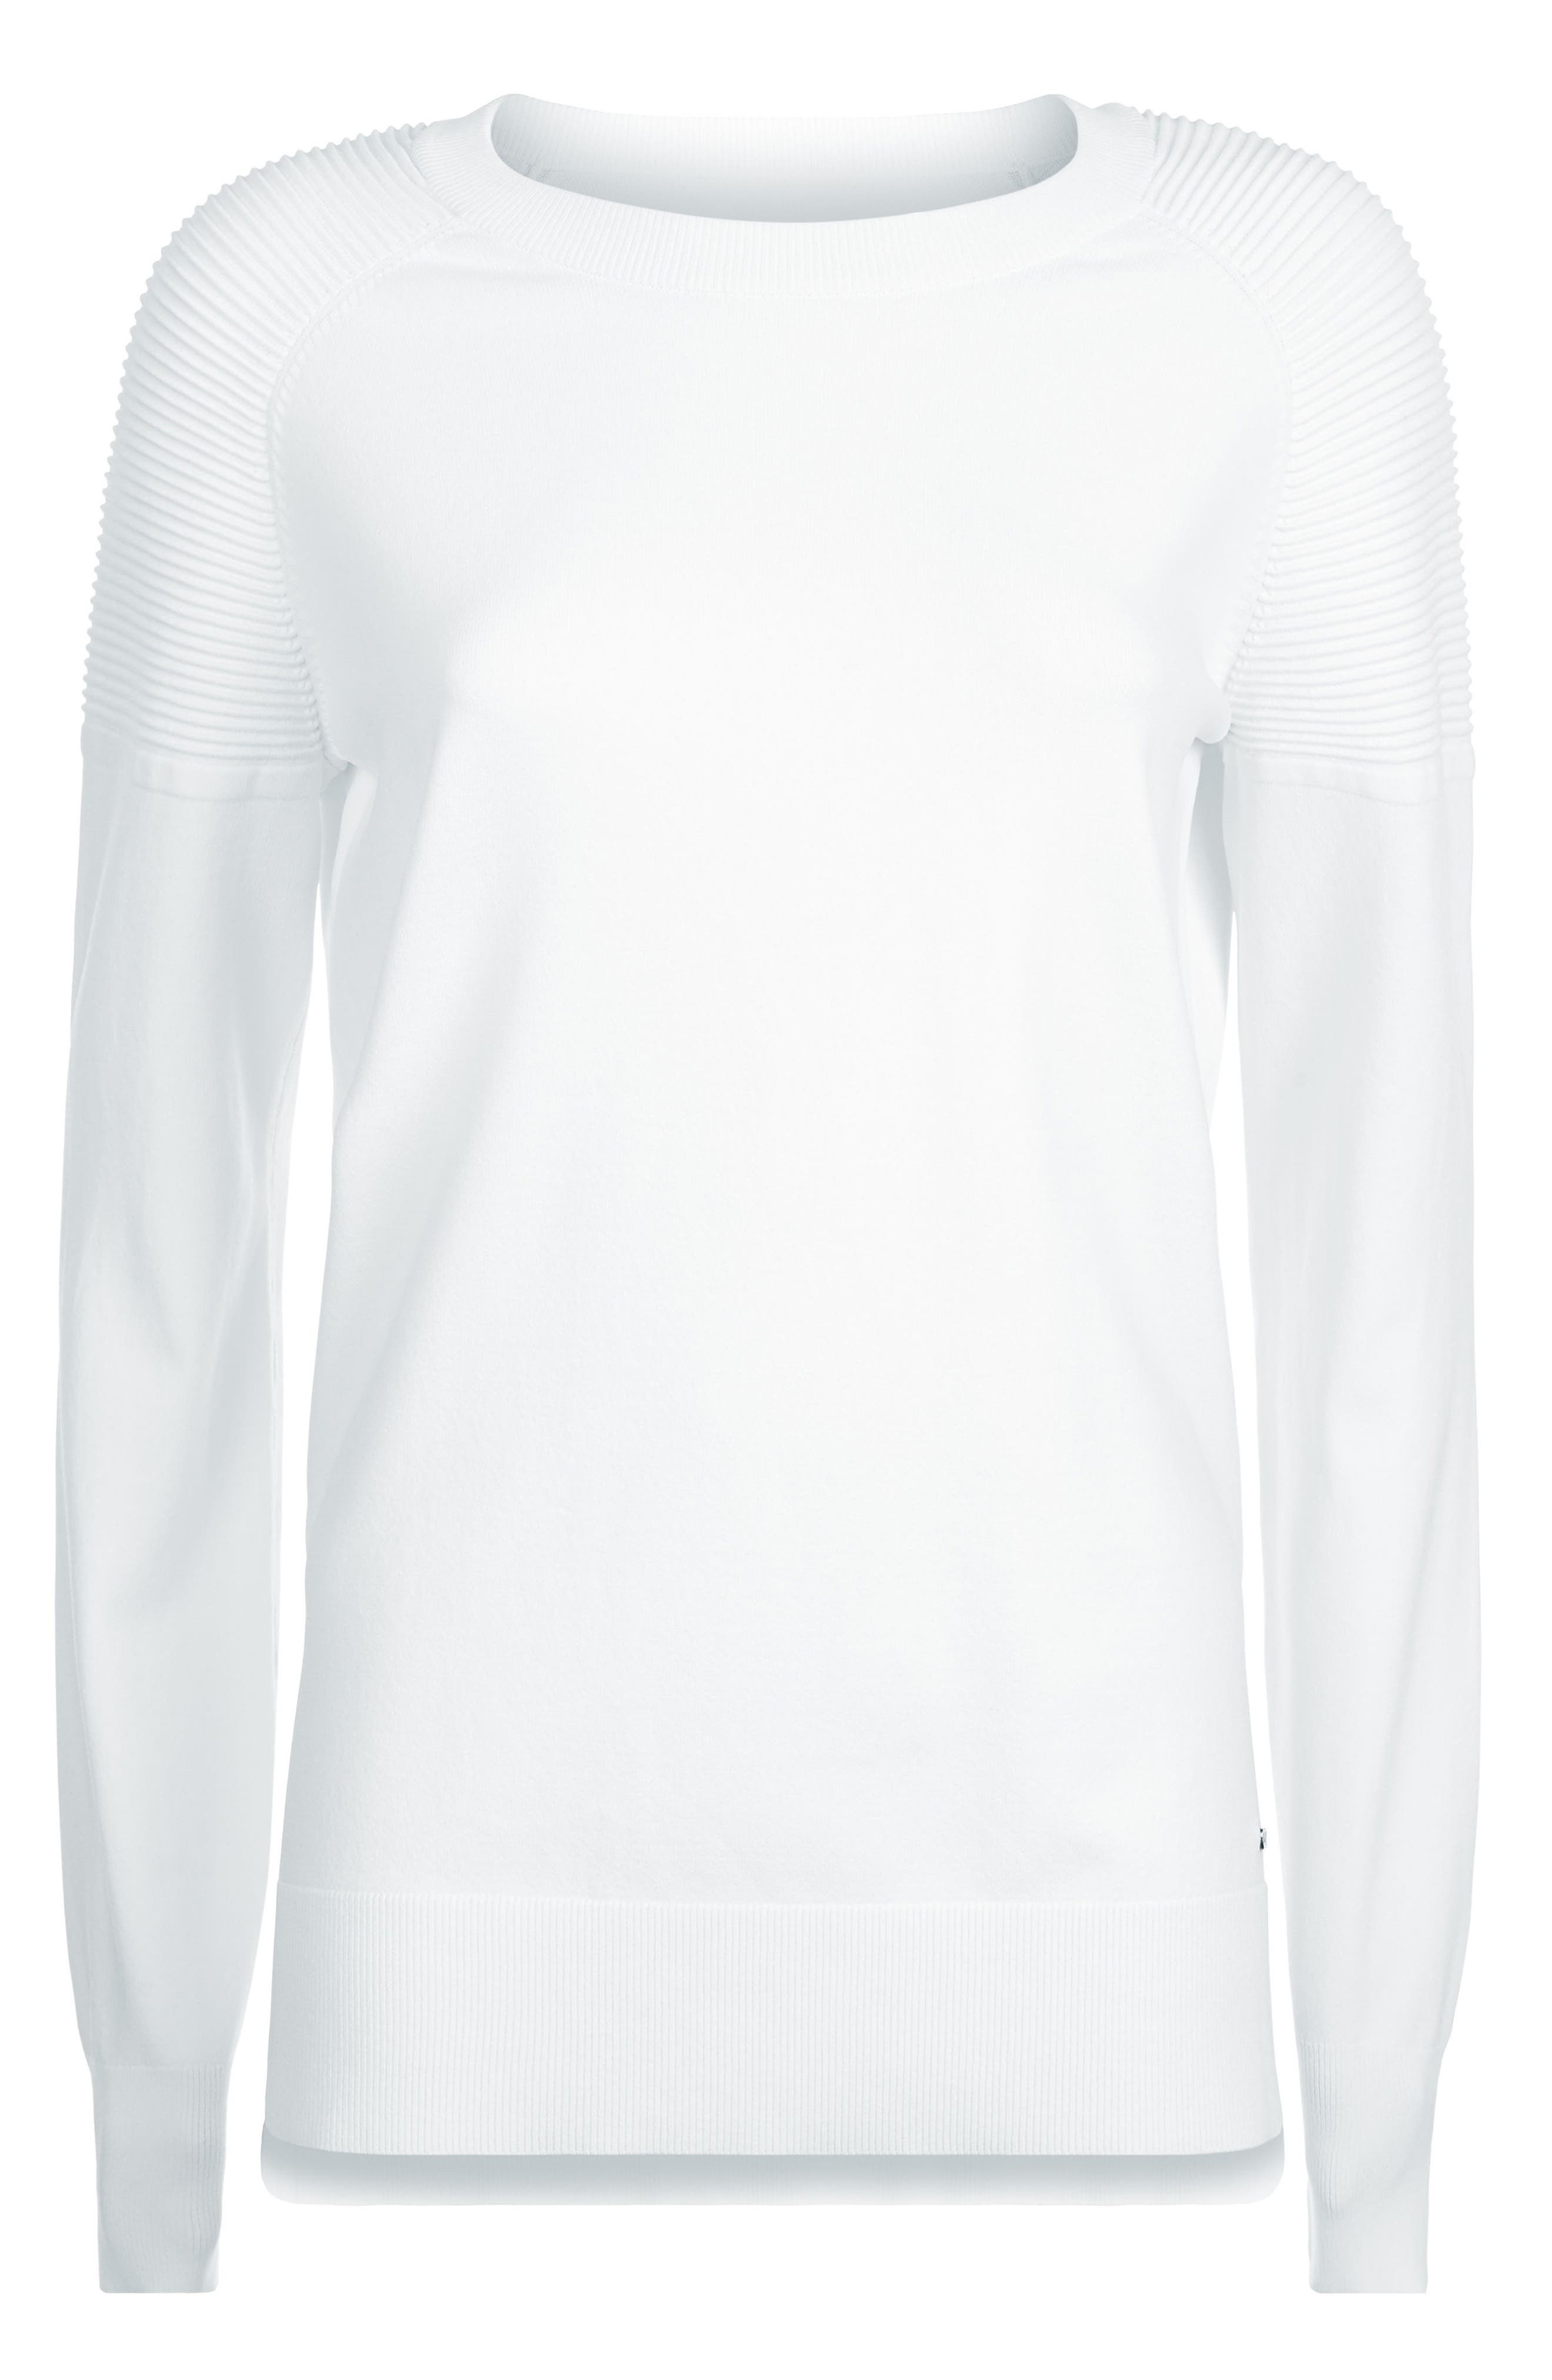 8 Track Sweatshirt,                             Alternate thumbnail 6, color,                             100